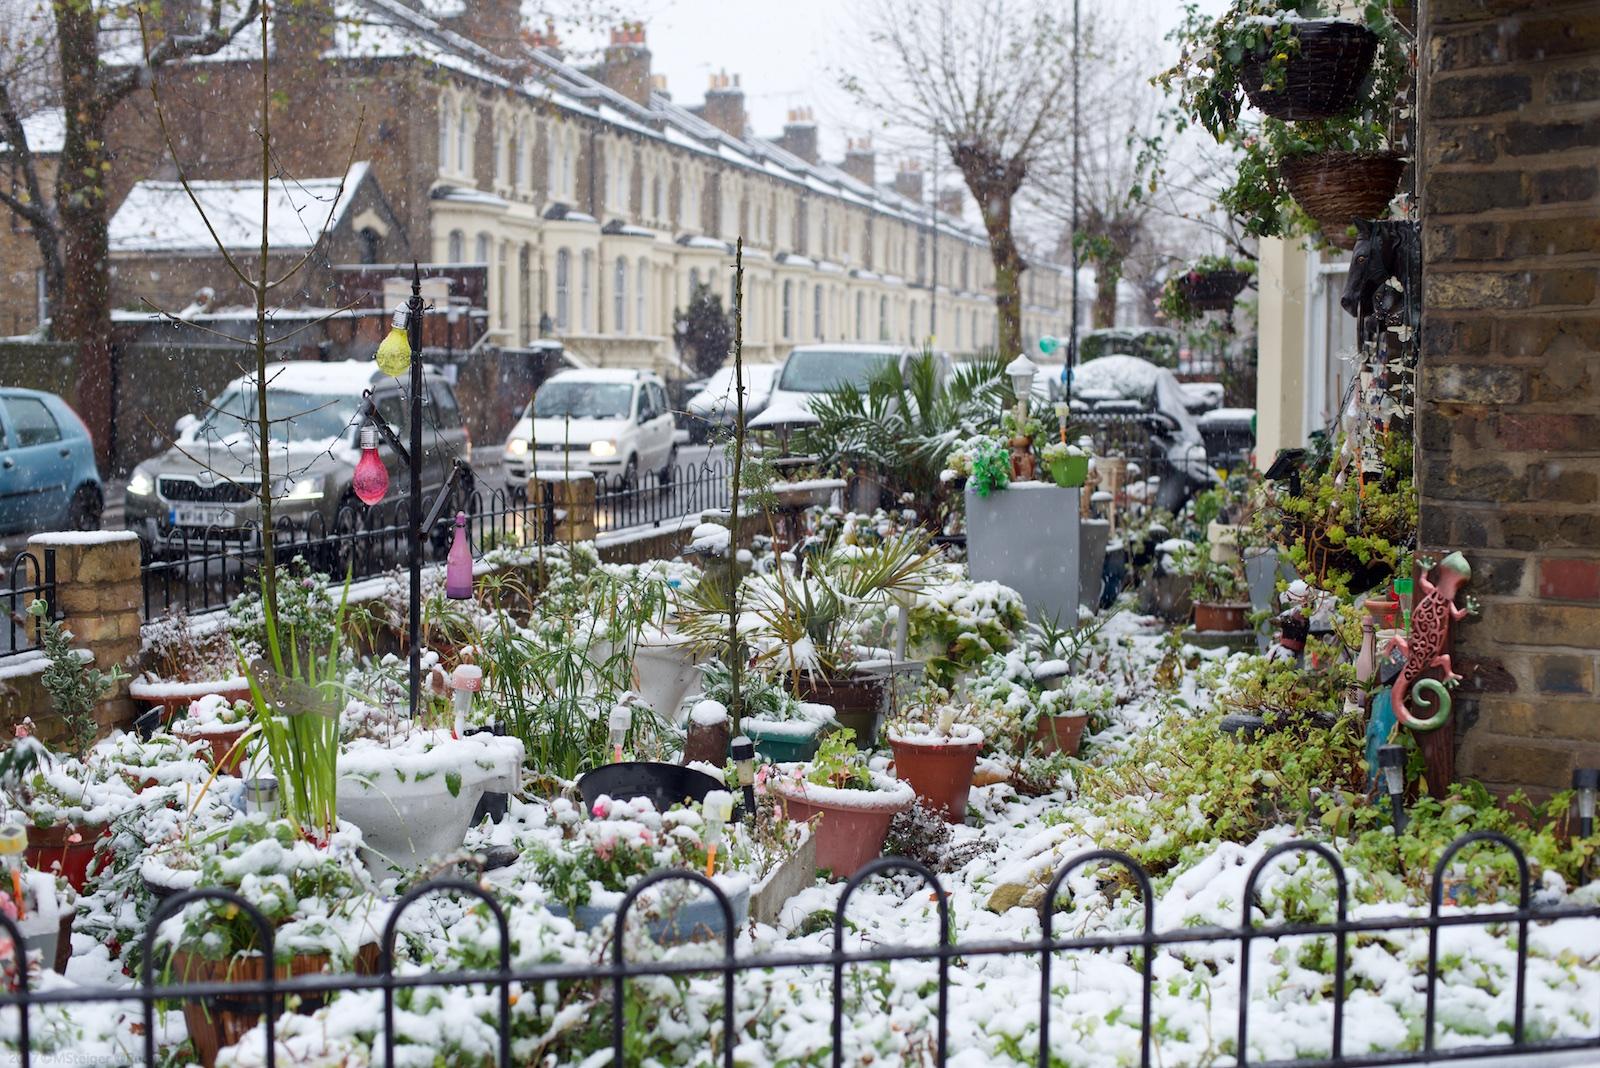 Doreen's garden